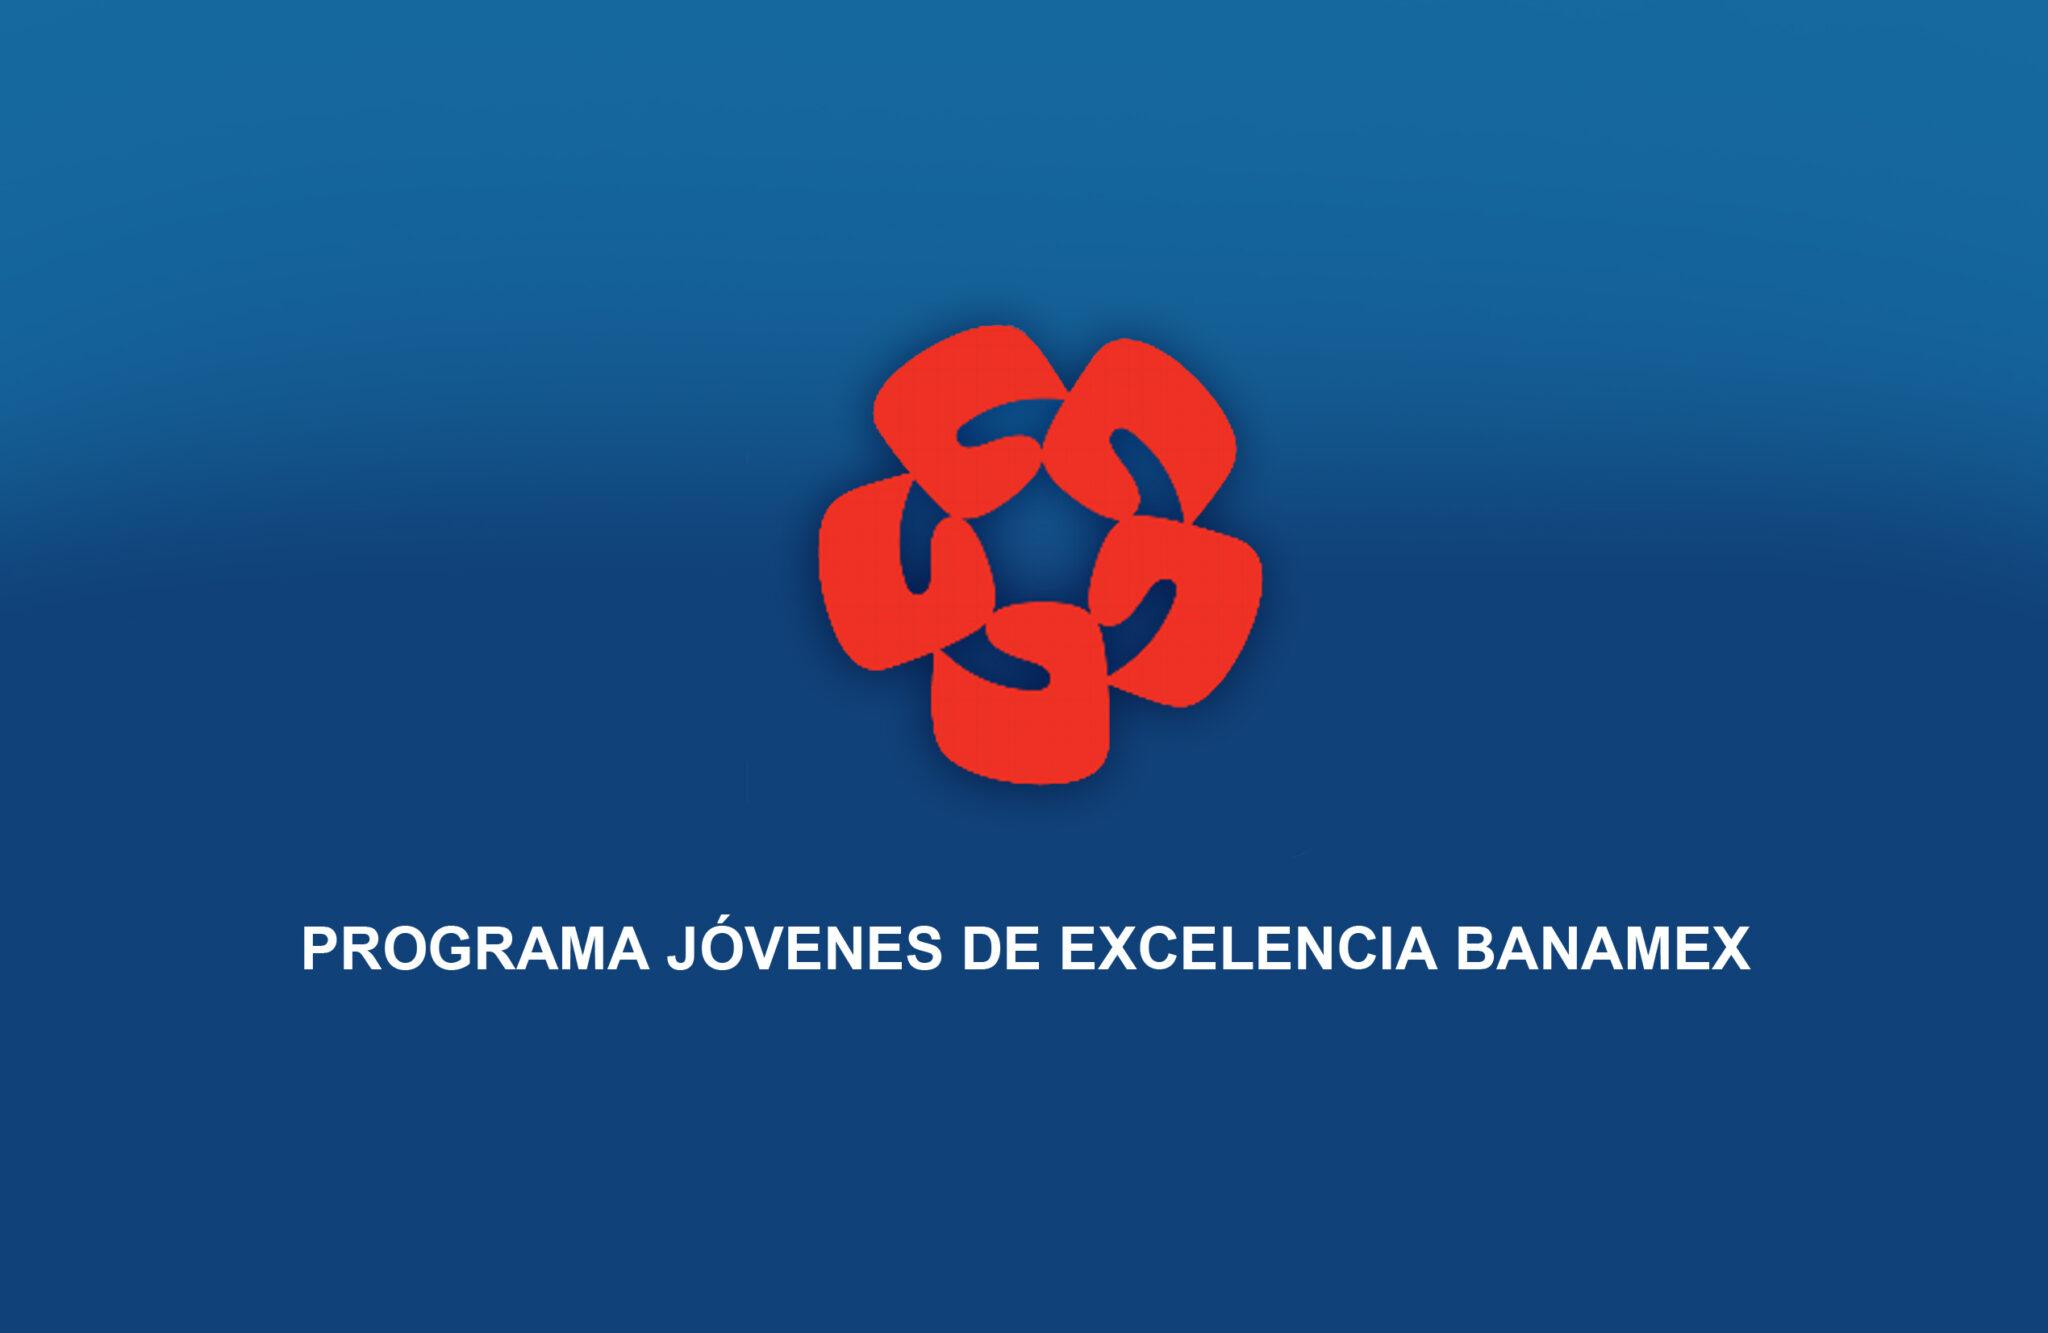 PROGRAMA JOVENES DE EXCELENCIA BANAMEX BANNER 2016